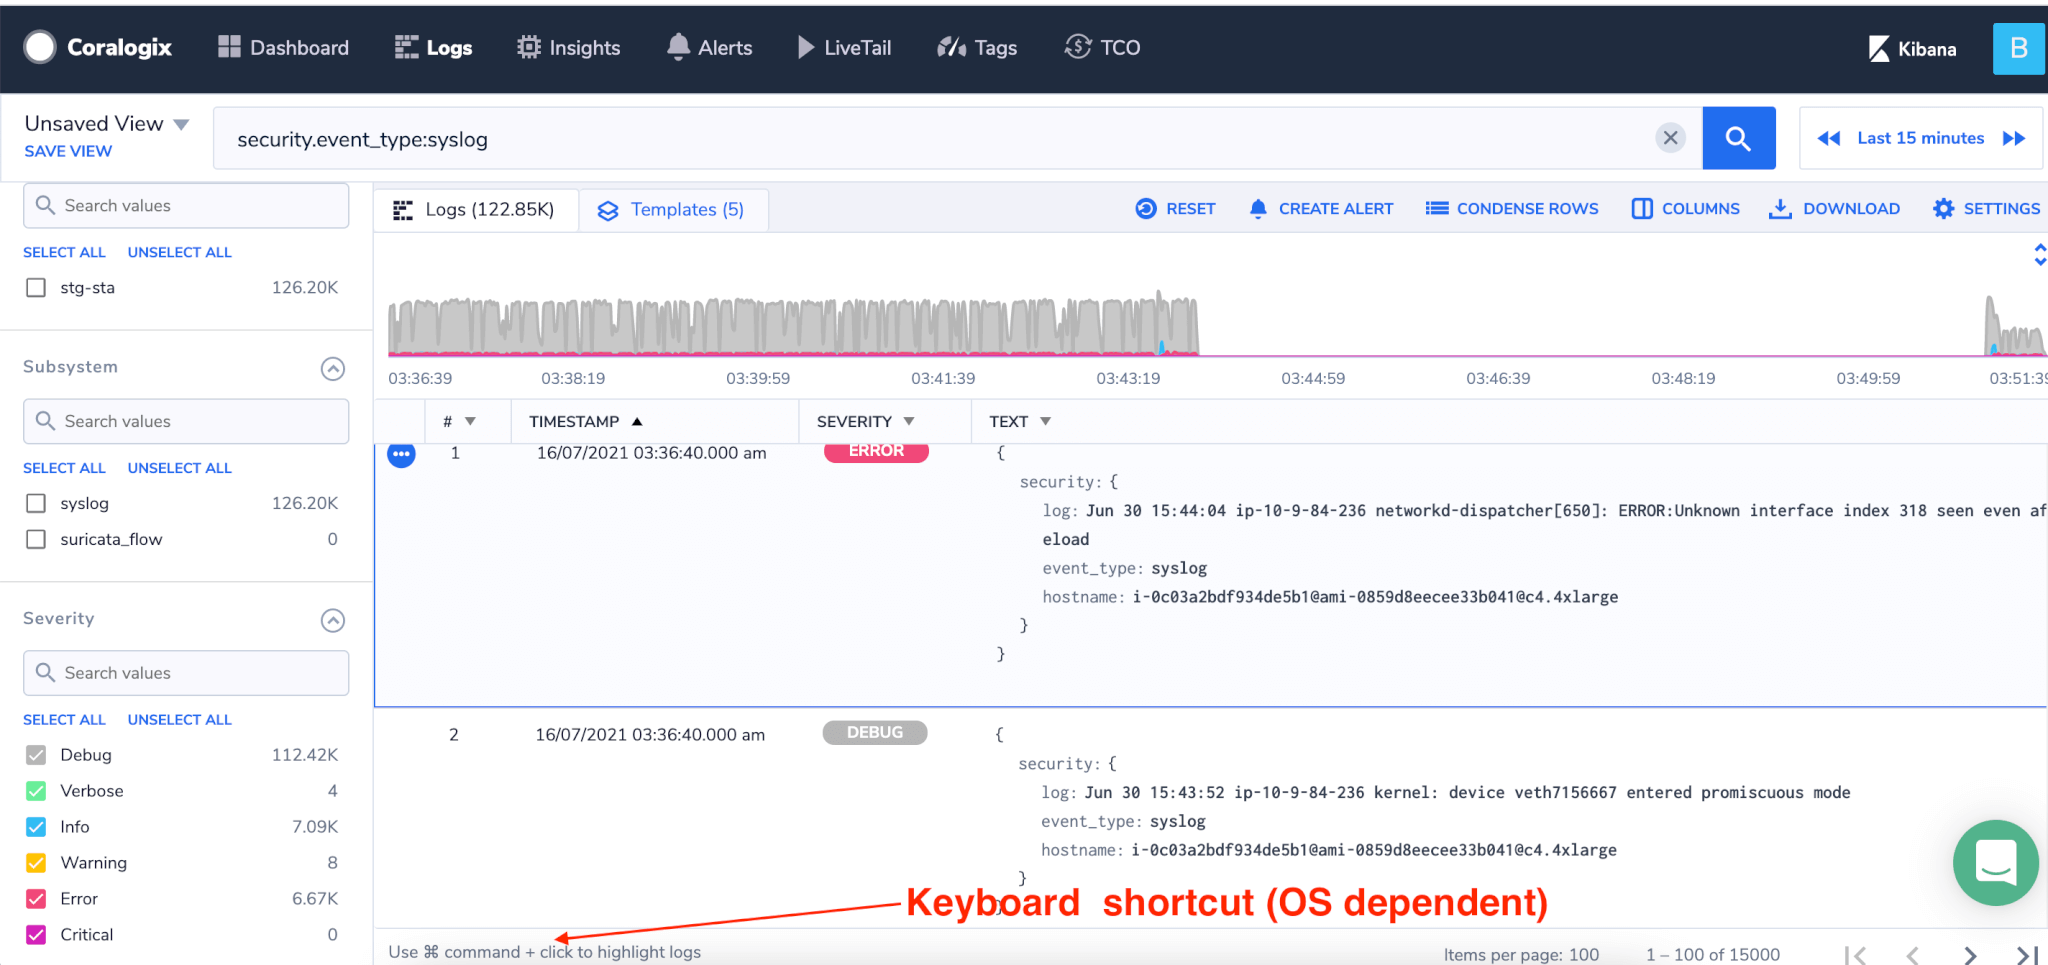 log screen highlight keyboard shortcut